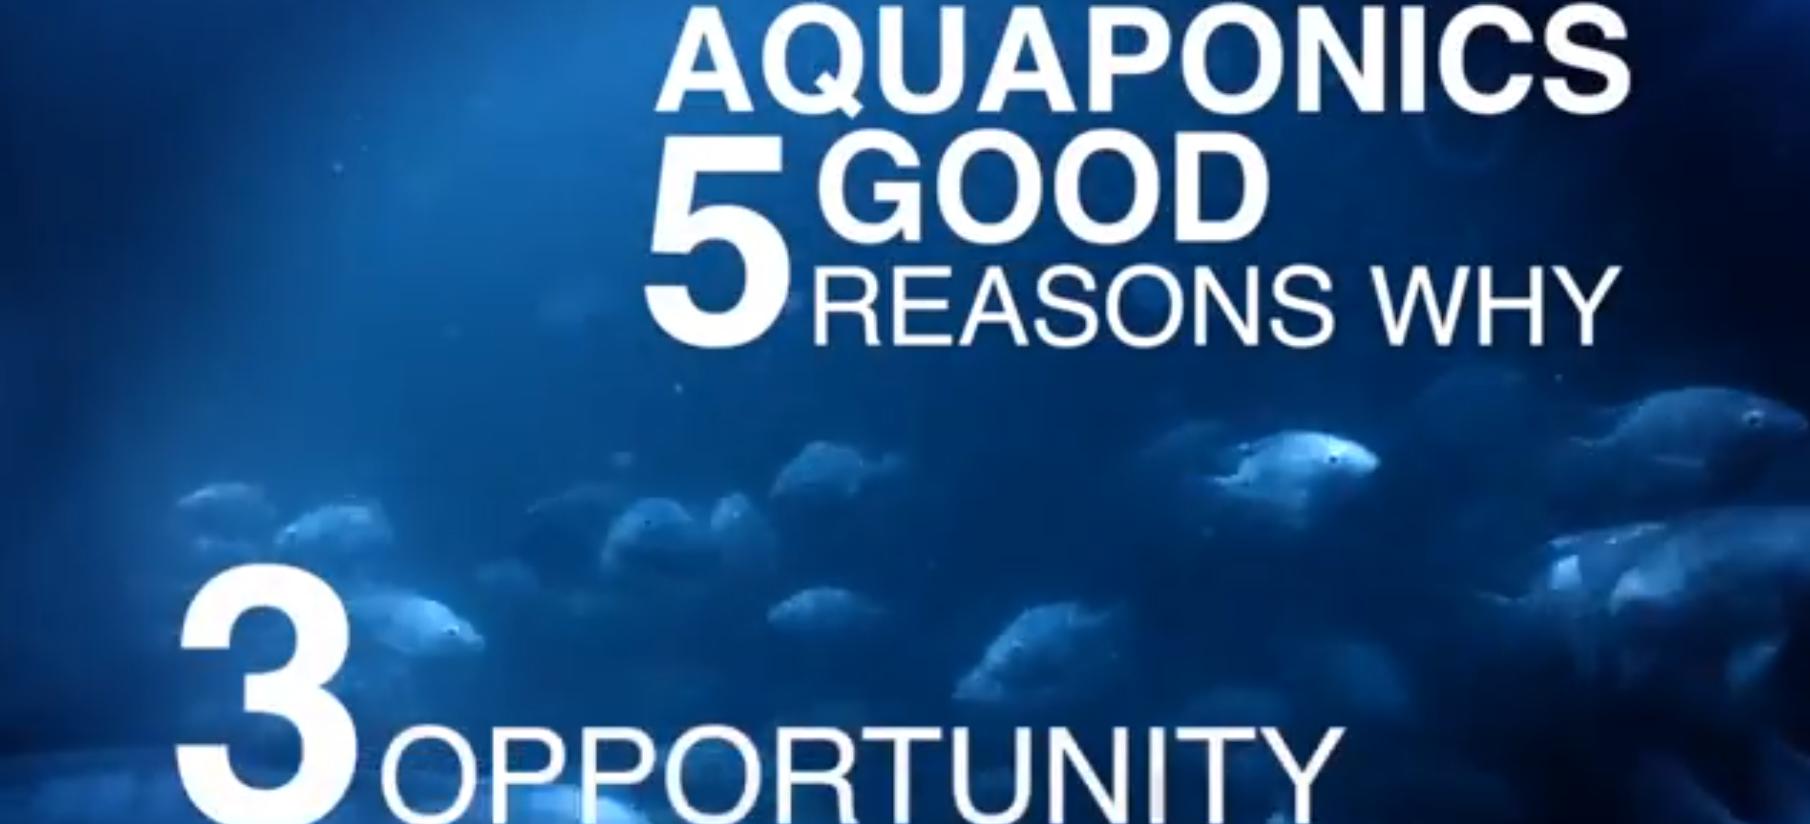 5 Good Reasons for Aquaponics: Reason 3–Economic Opportunity